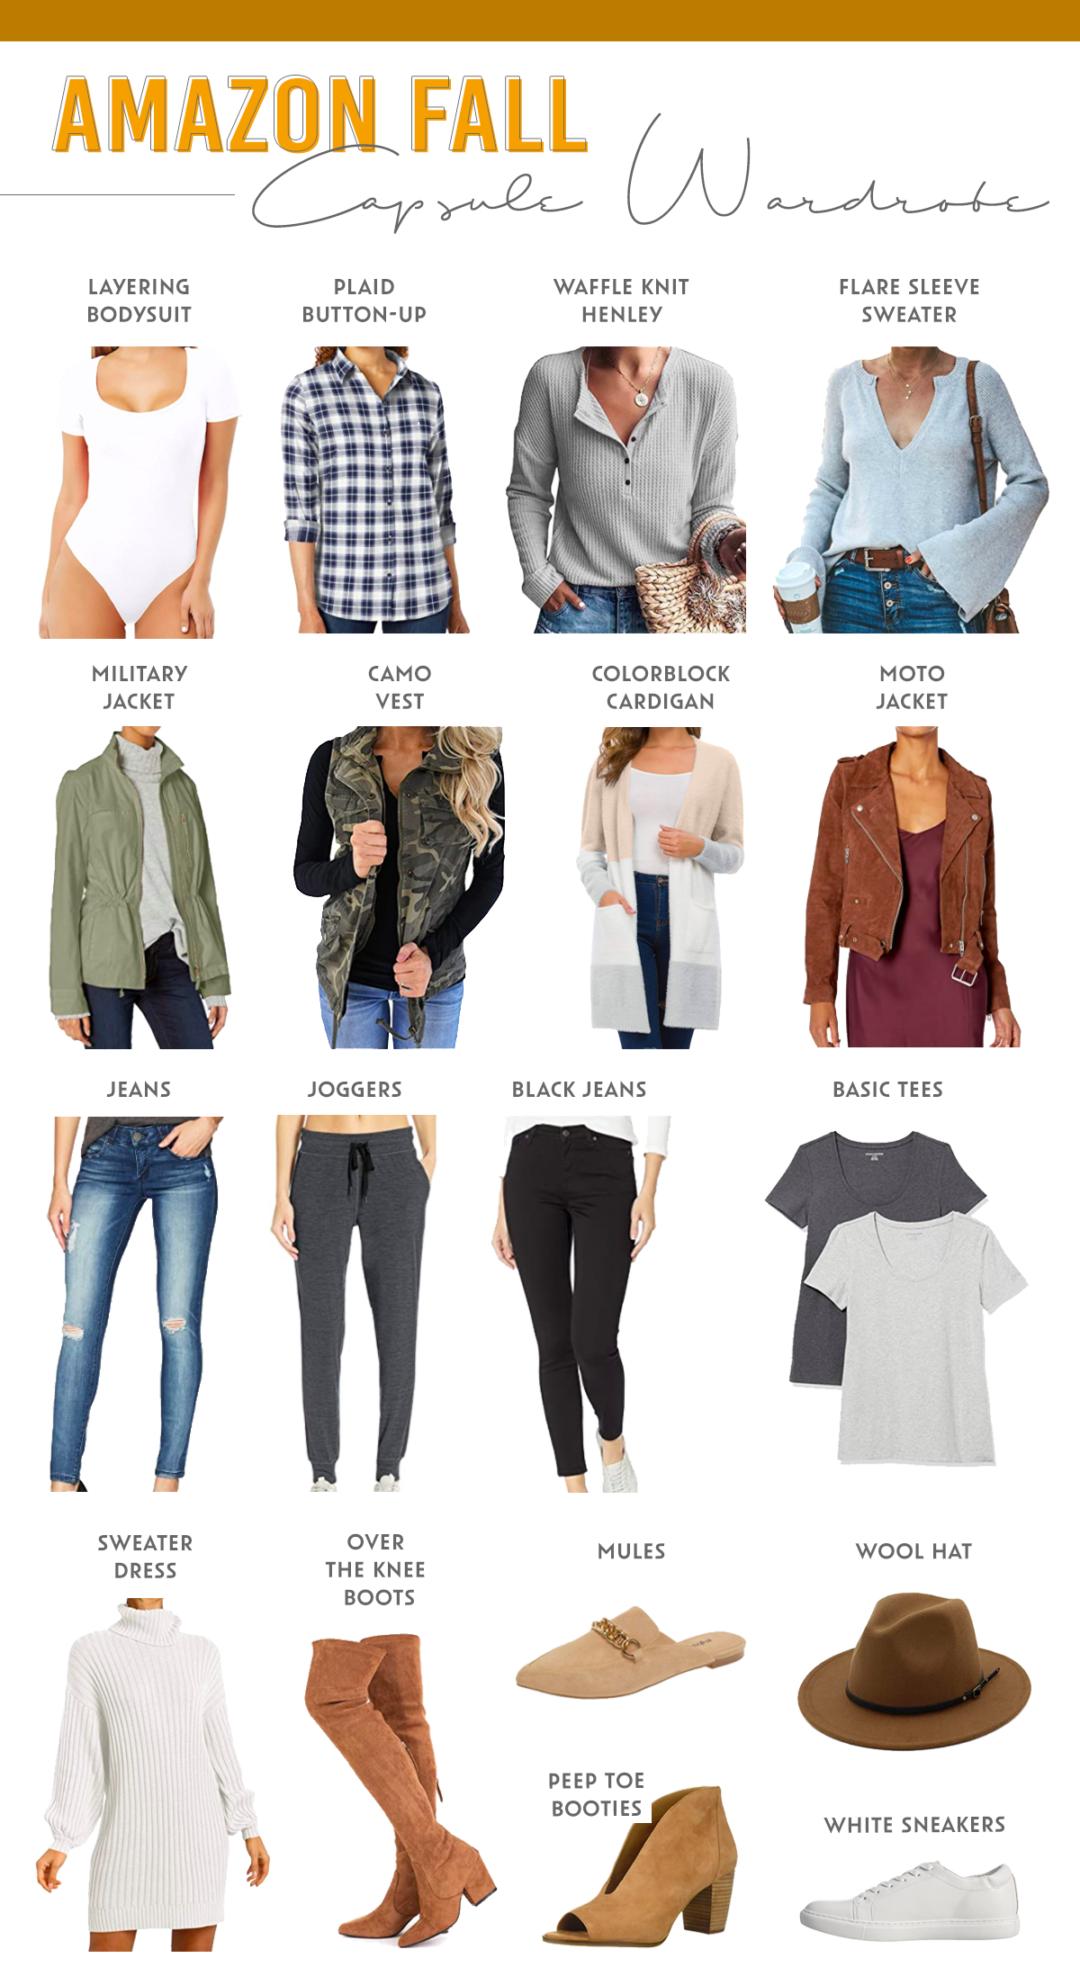 amazon fall 2020 capsule wardrobe for minimalist on pinteresting plans fashion blog